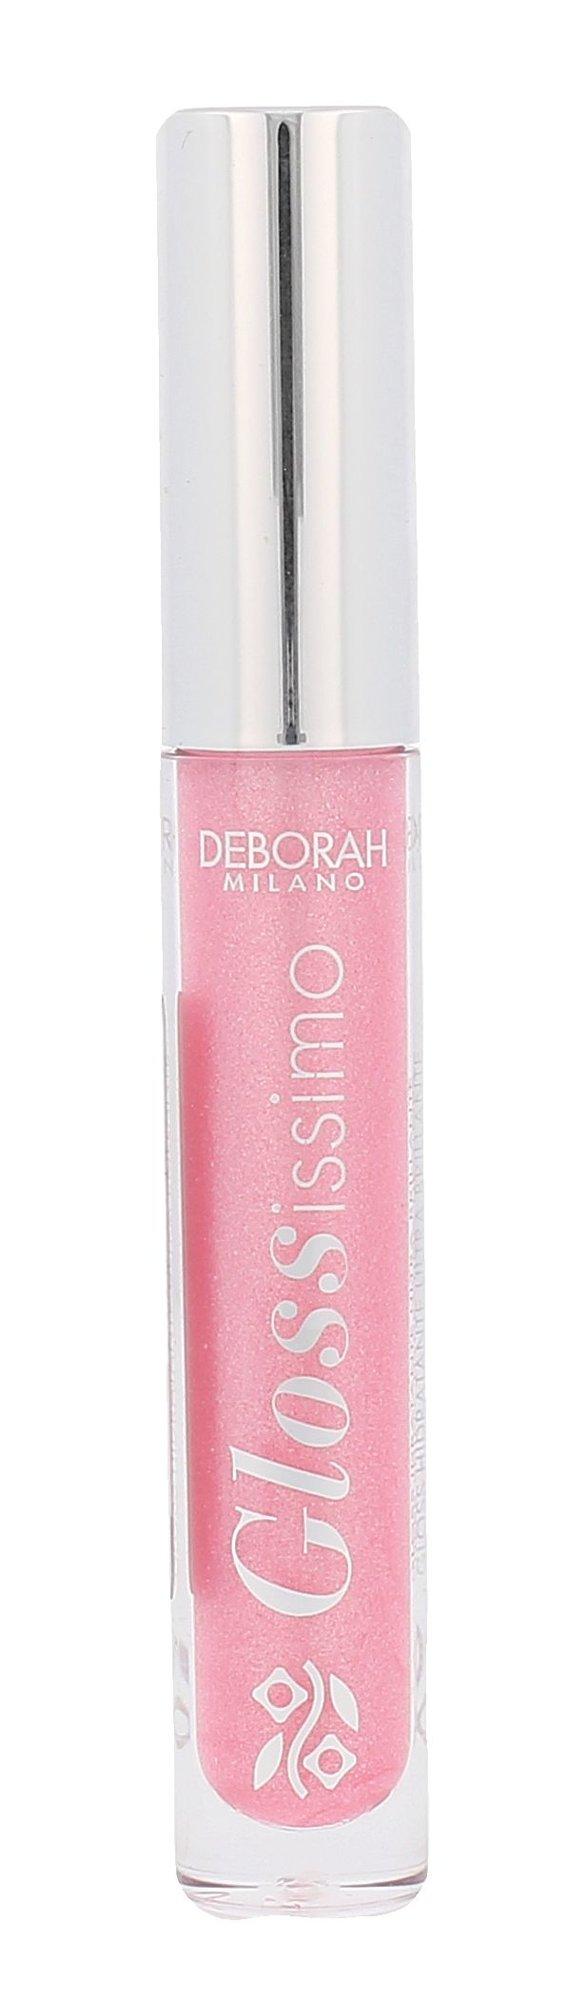 Deborah Milano Glossissimo Cosmetic 10ml 03